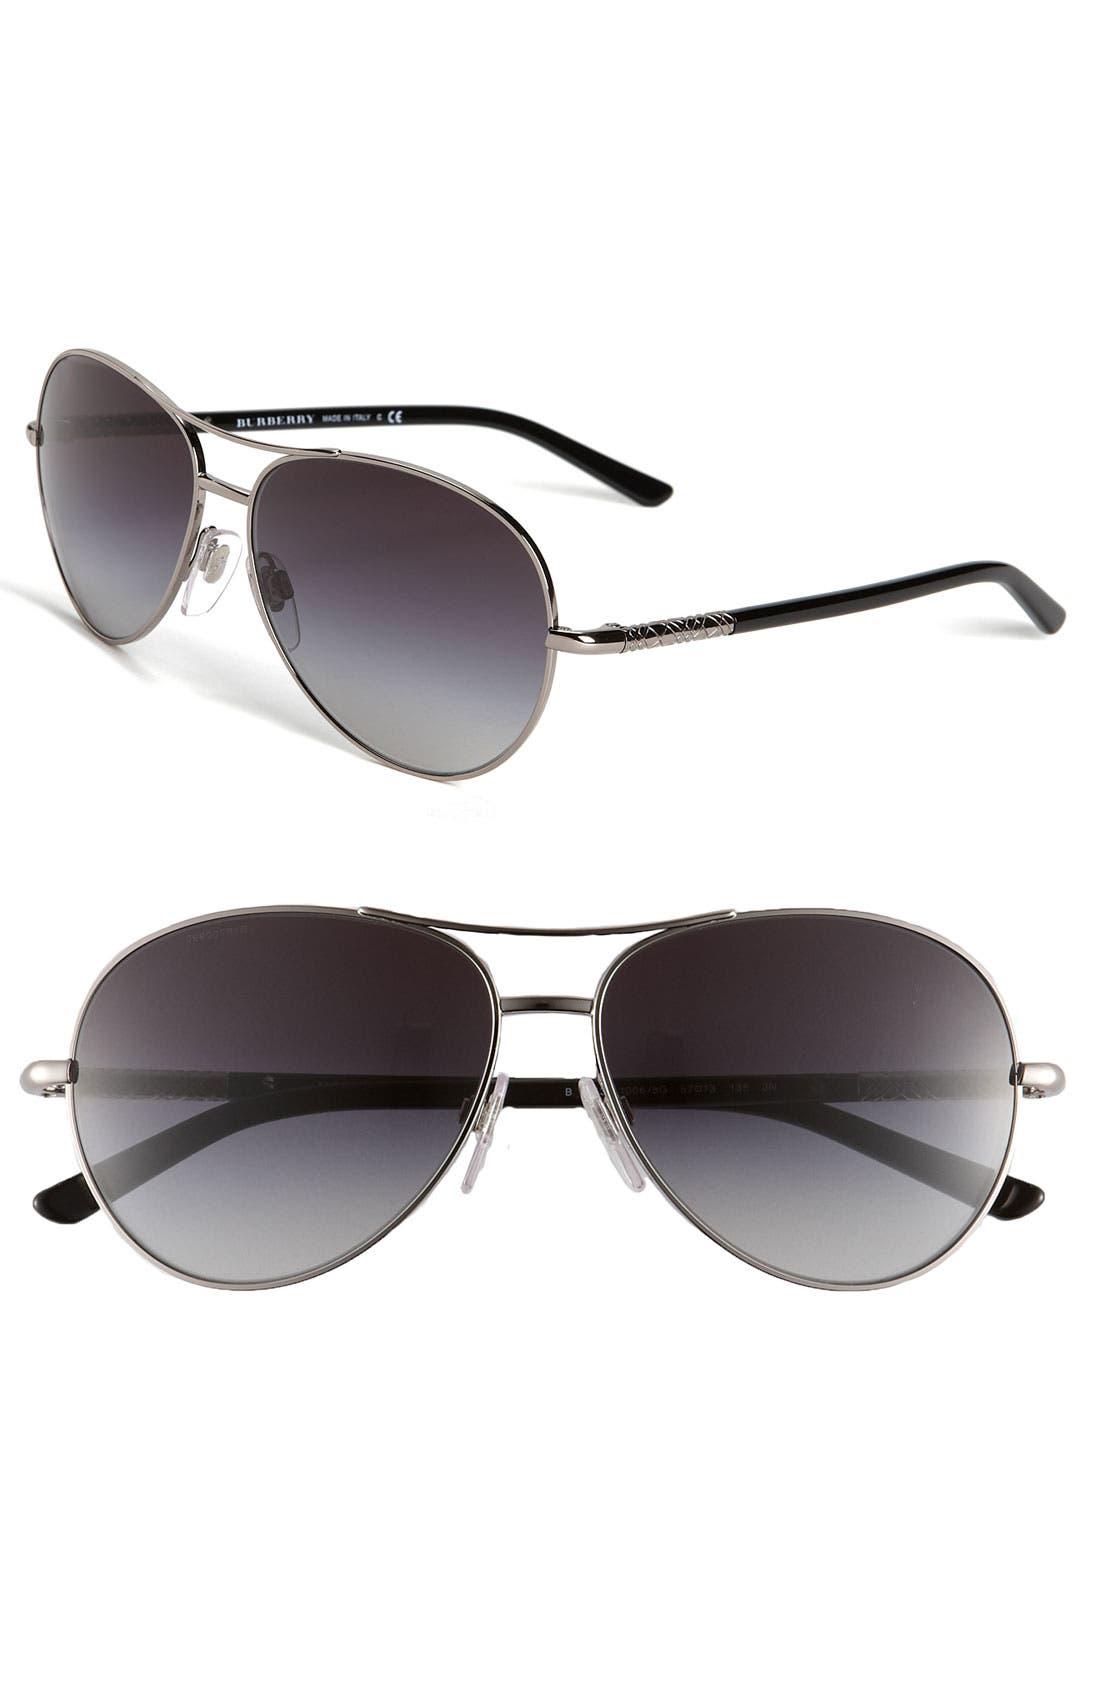 Main Image - Burberry Metal Aviator Sunglasses